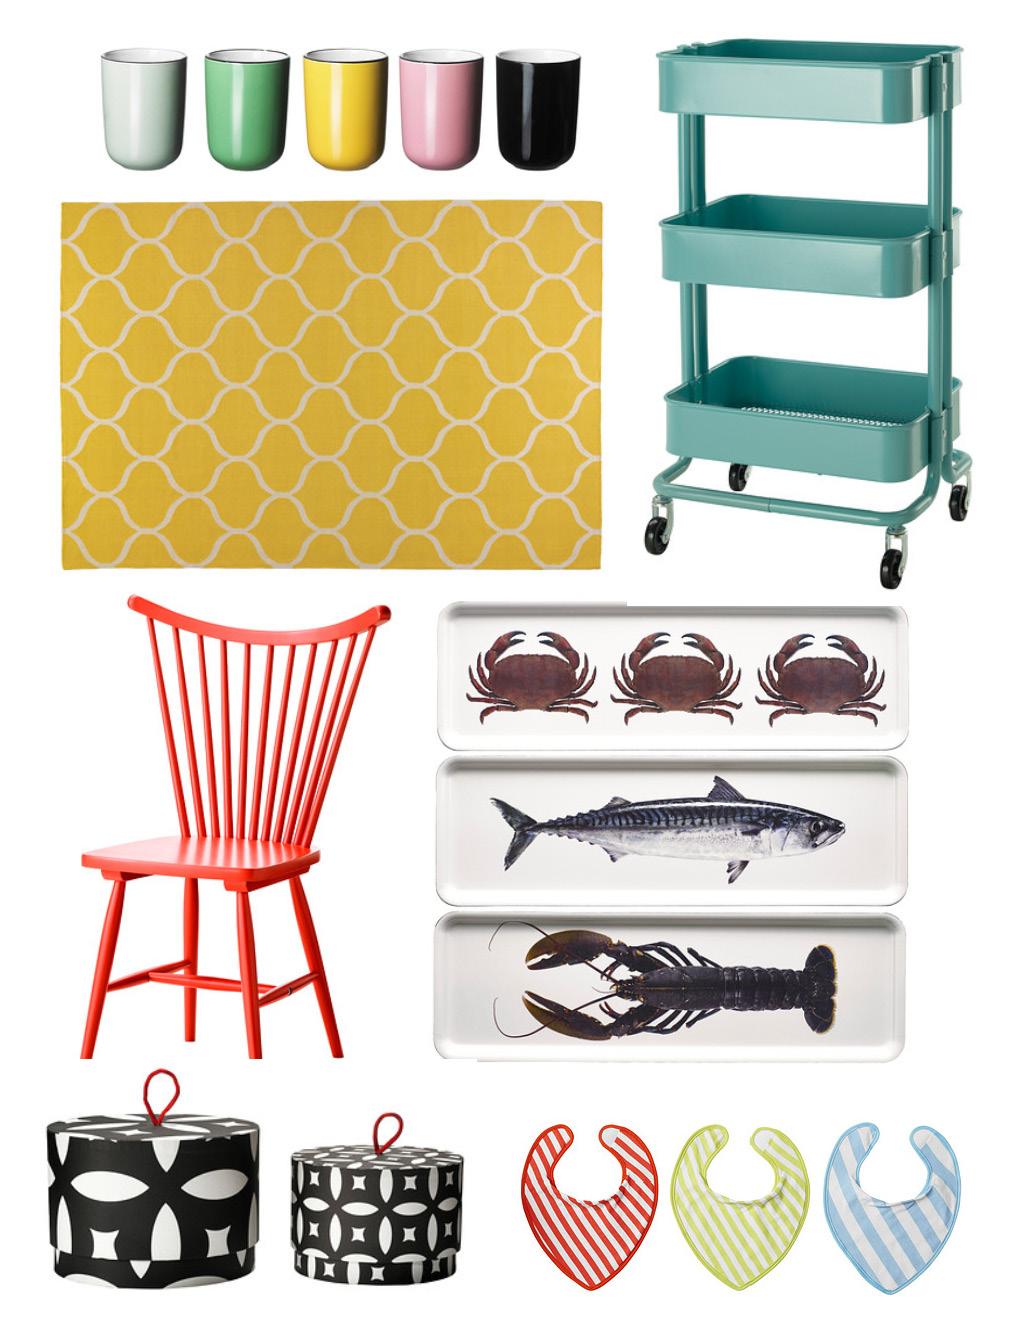 IKEA love.jpg